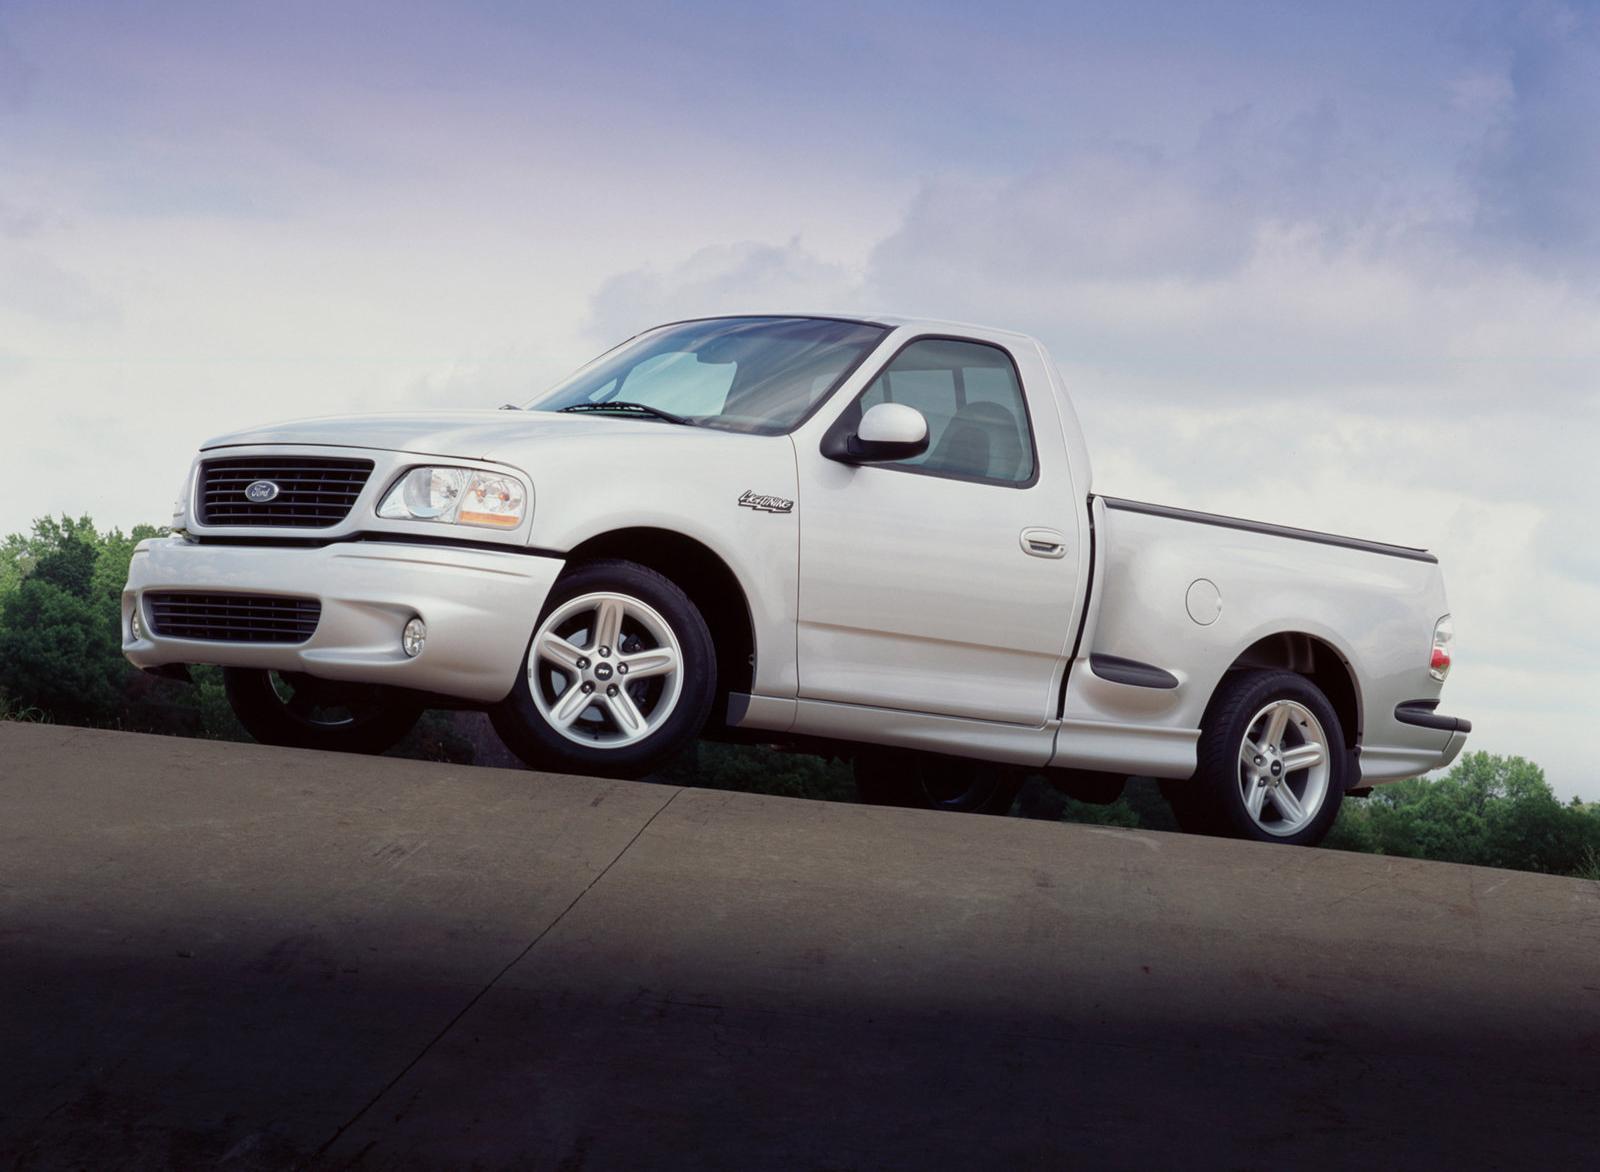 2004 Silver Ford SVT Lightning Front Three-Quarter